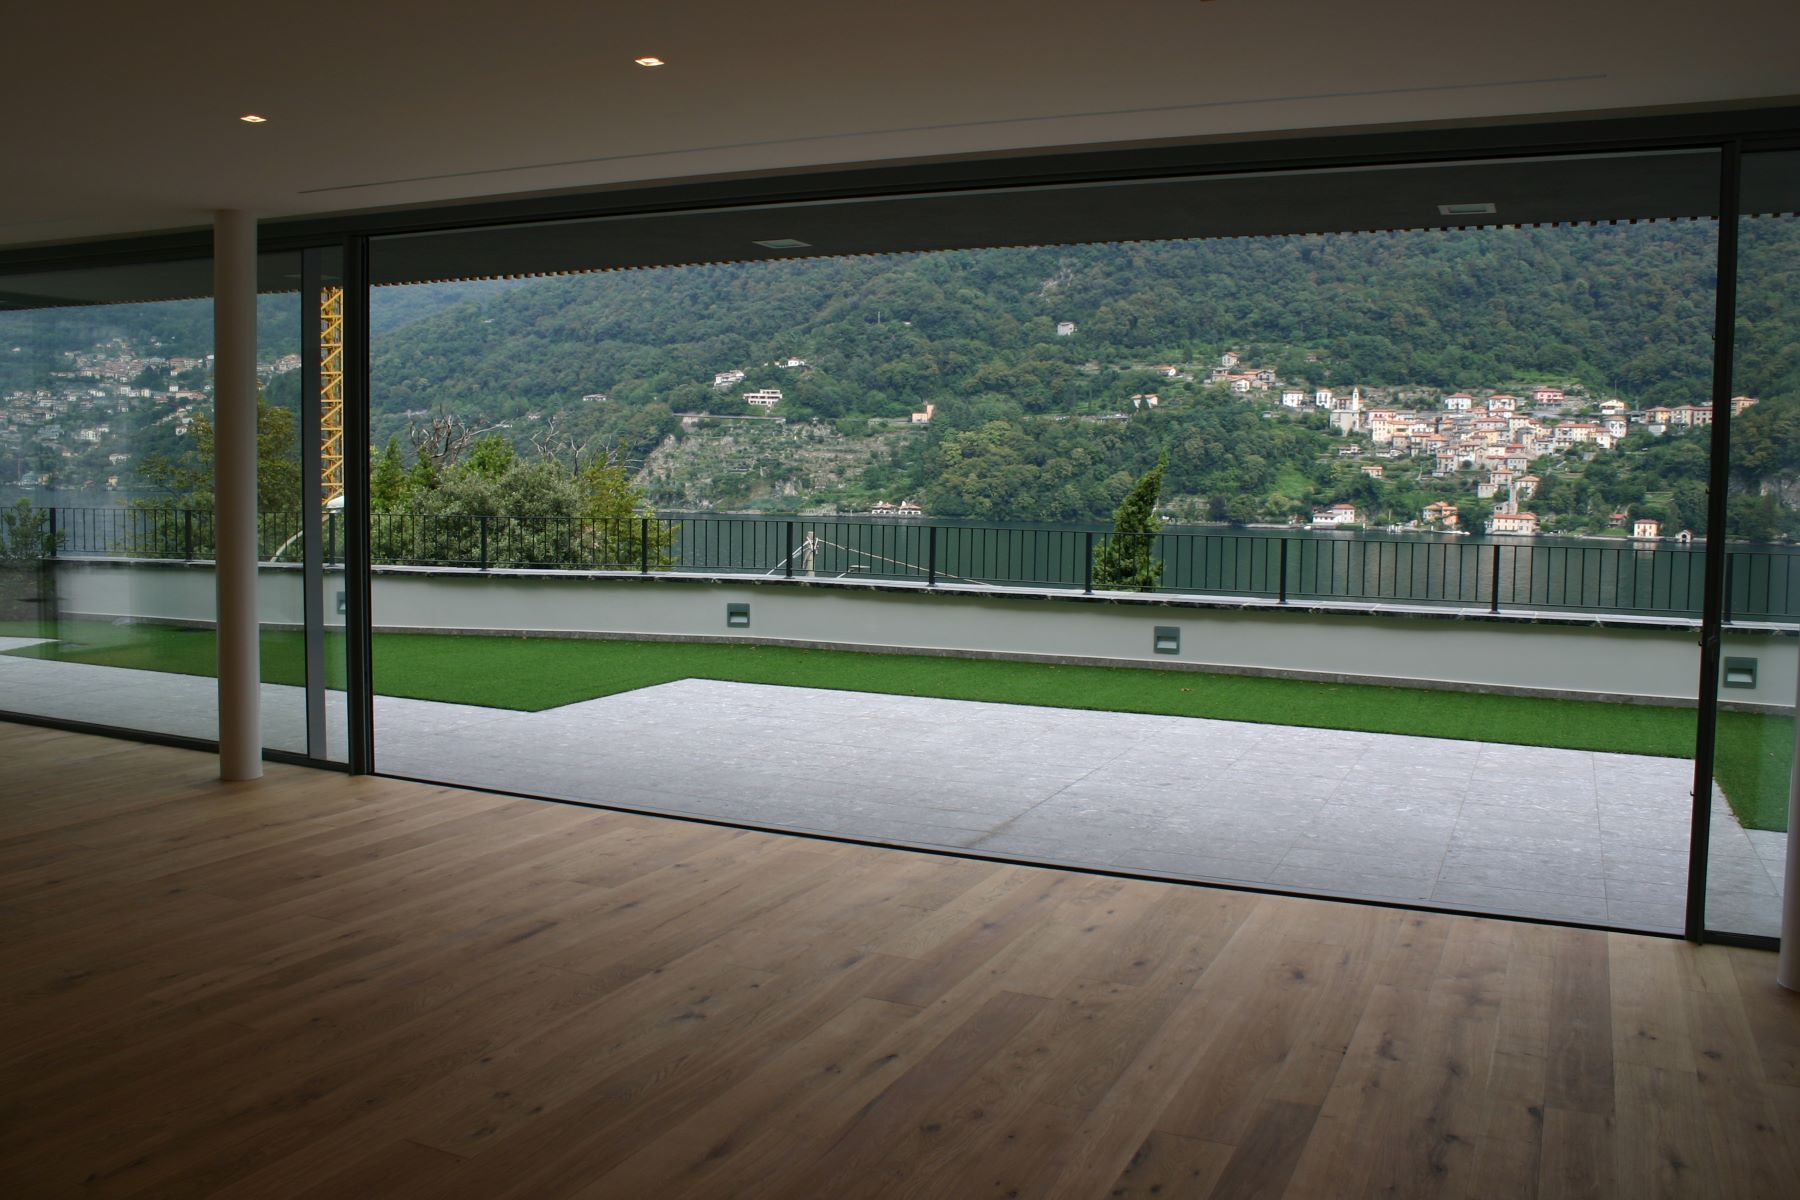 Additional photo for property listing at Prestigious modern villa with private swimming pool and magnificent Lake views Laglio Laglio, Como 22010 Italy